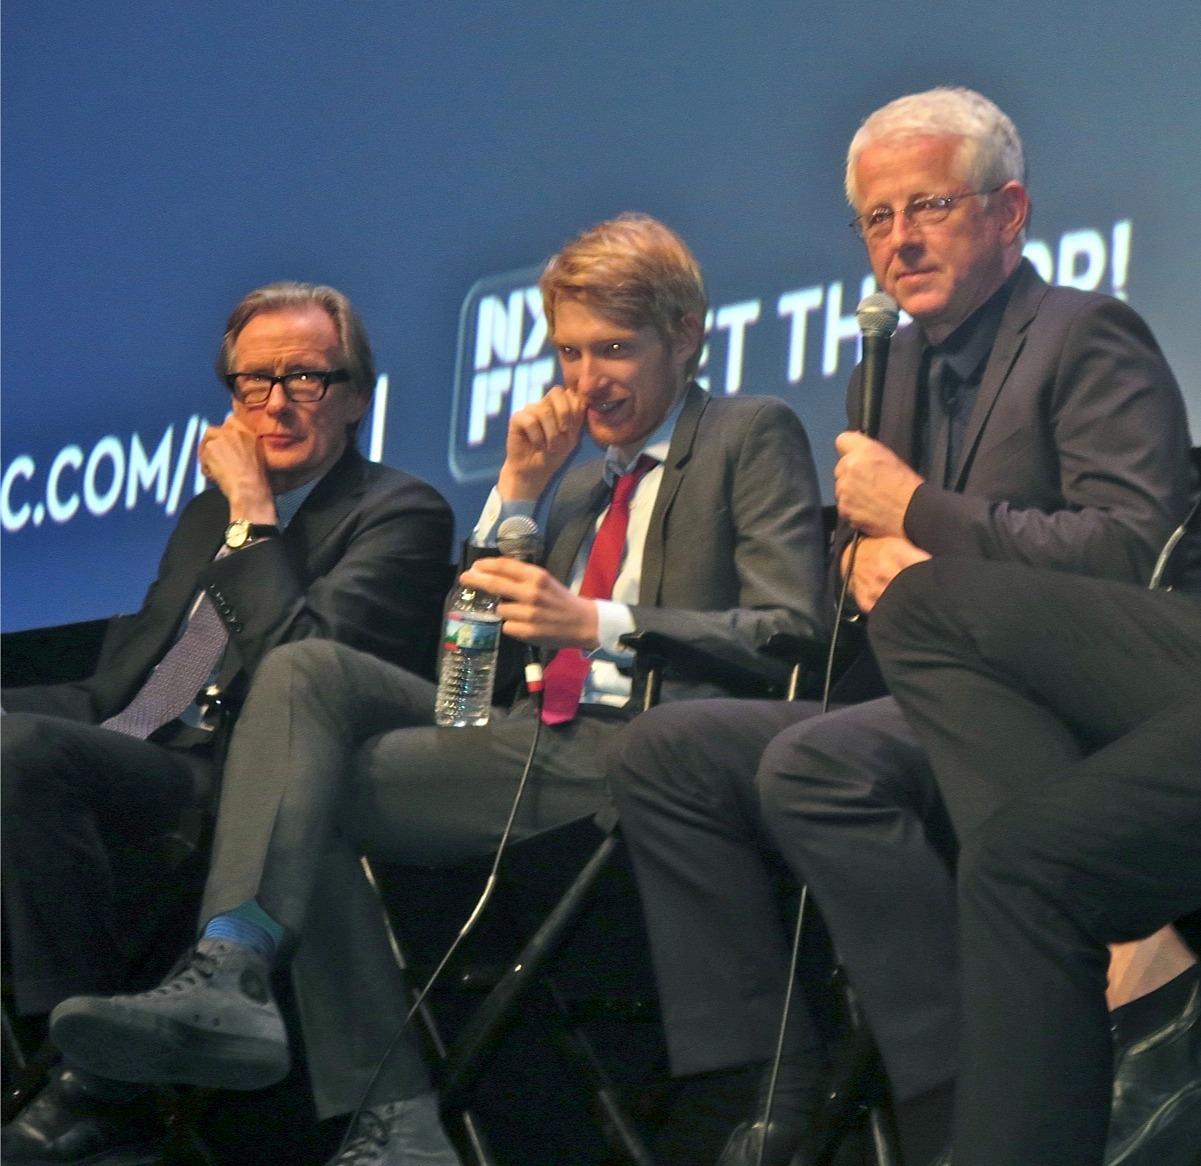 NYFF 2013: Bill Nighy Talks